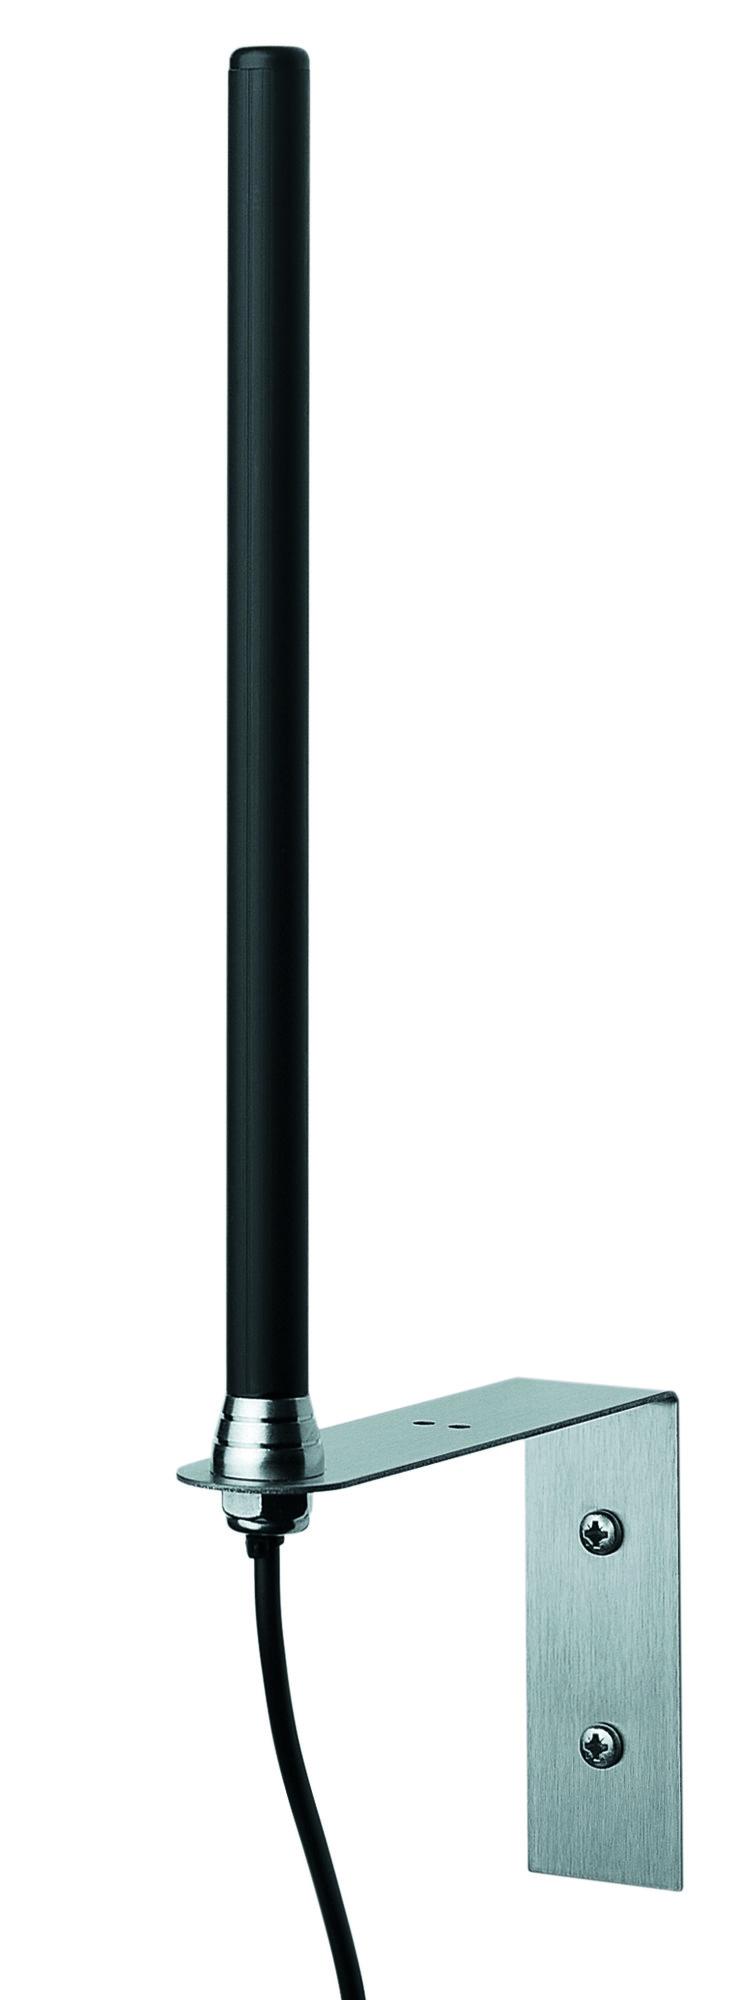 Antenne CEL 80 26 STAT/SMA/5.0